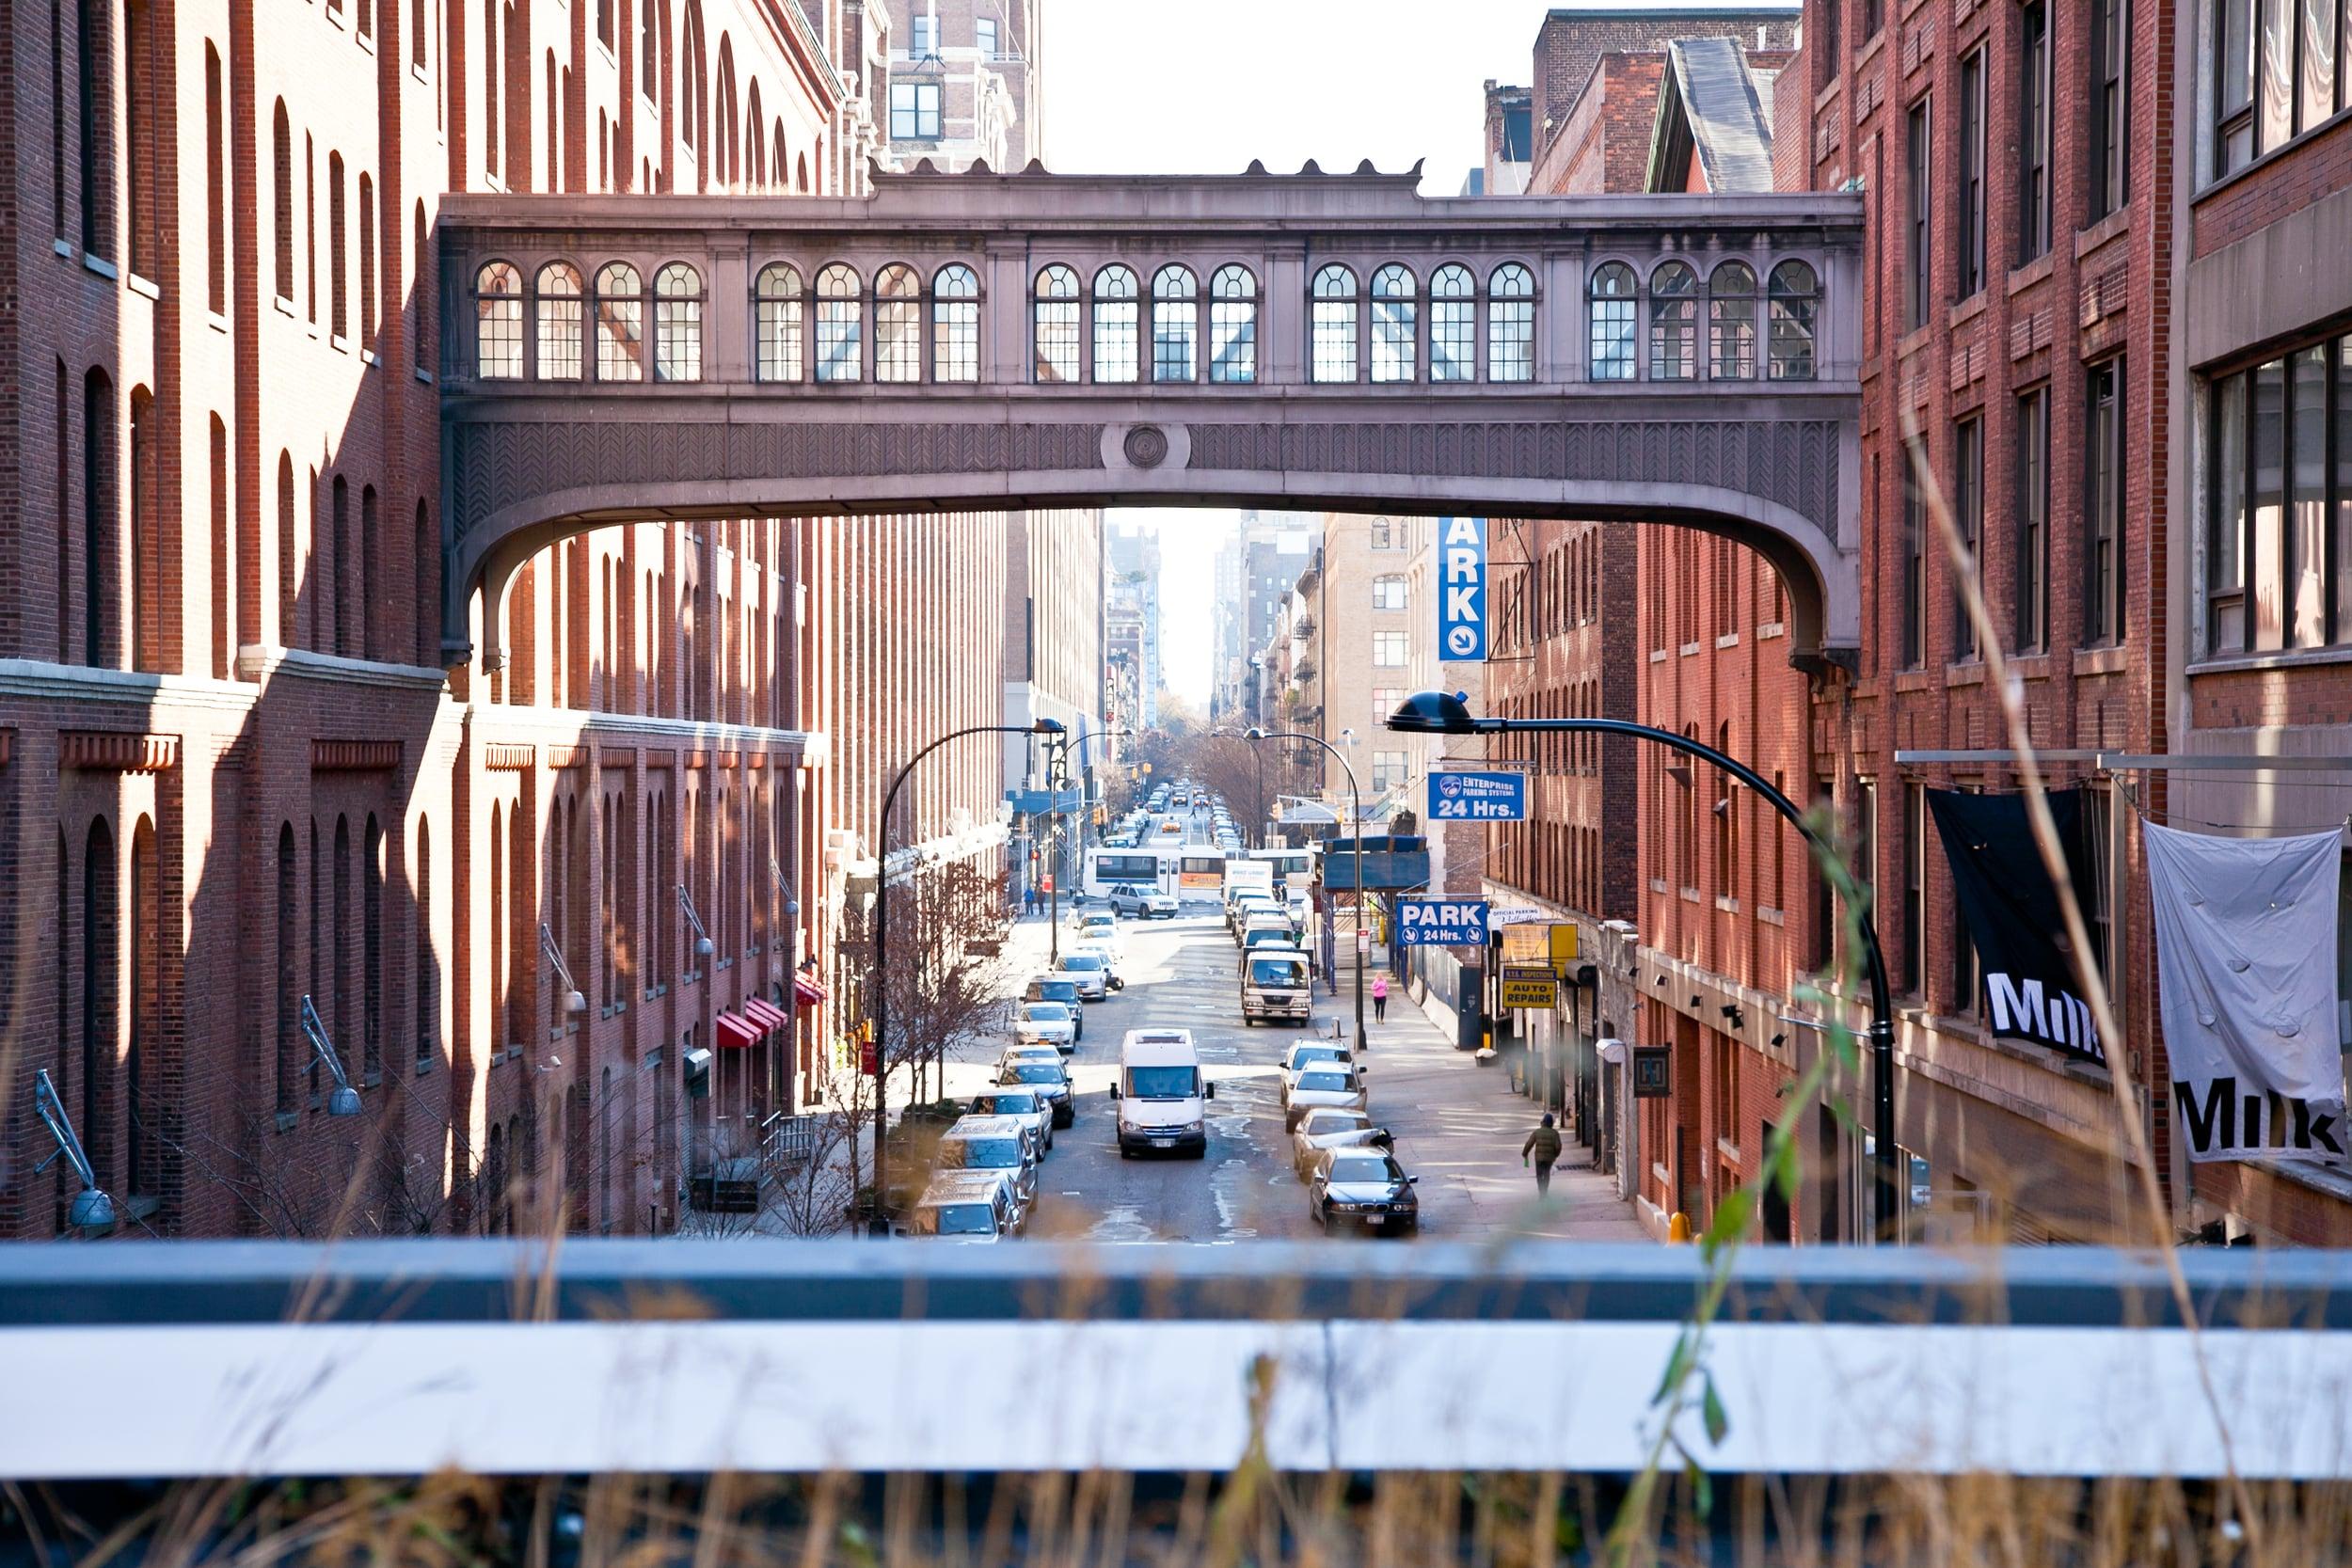 trisa-taro-high line-bridge-new york city.jpg